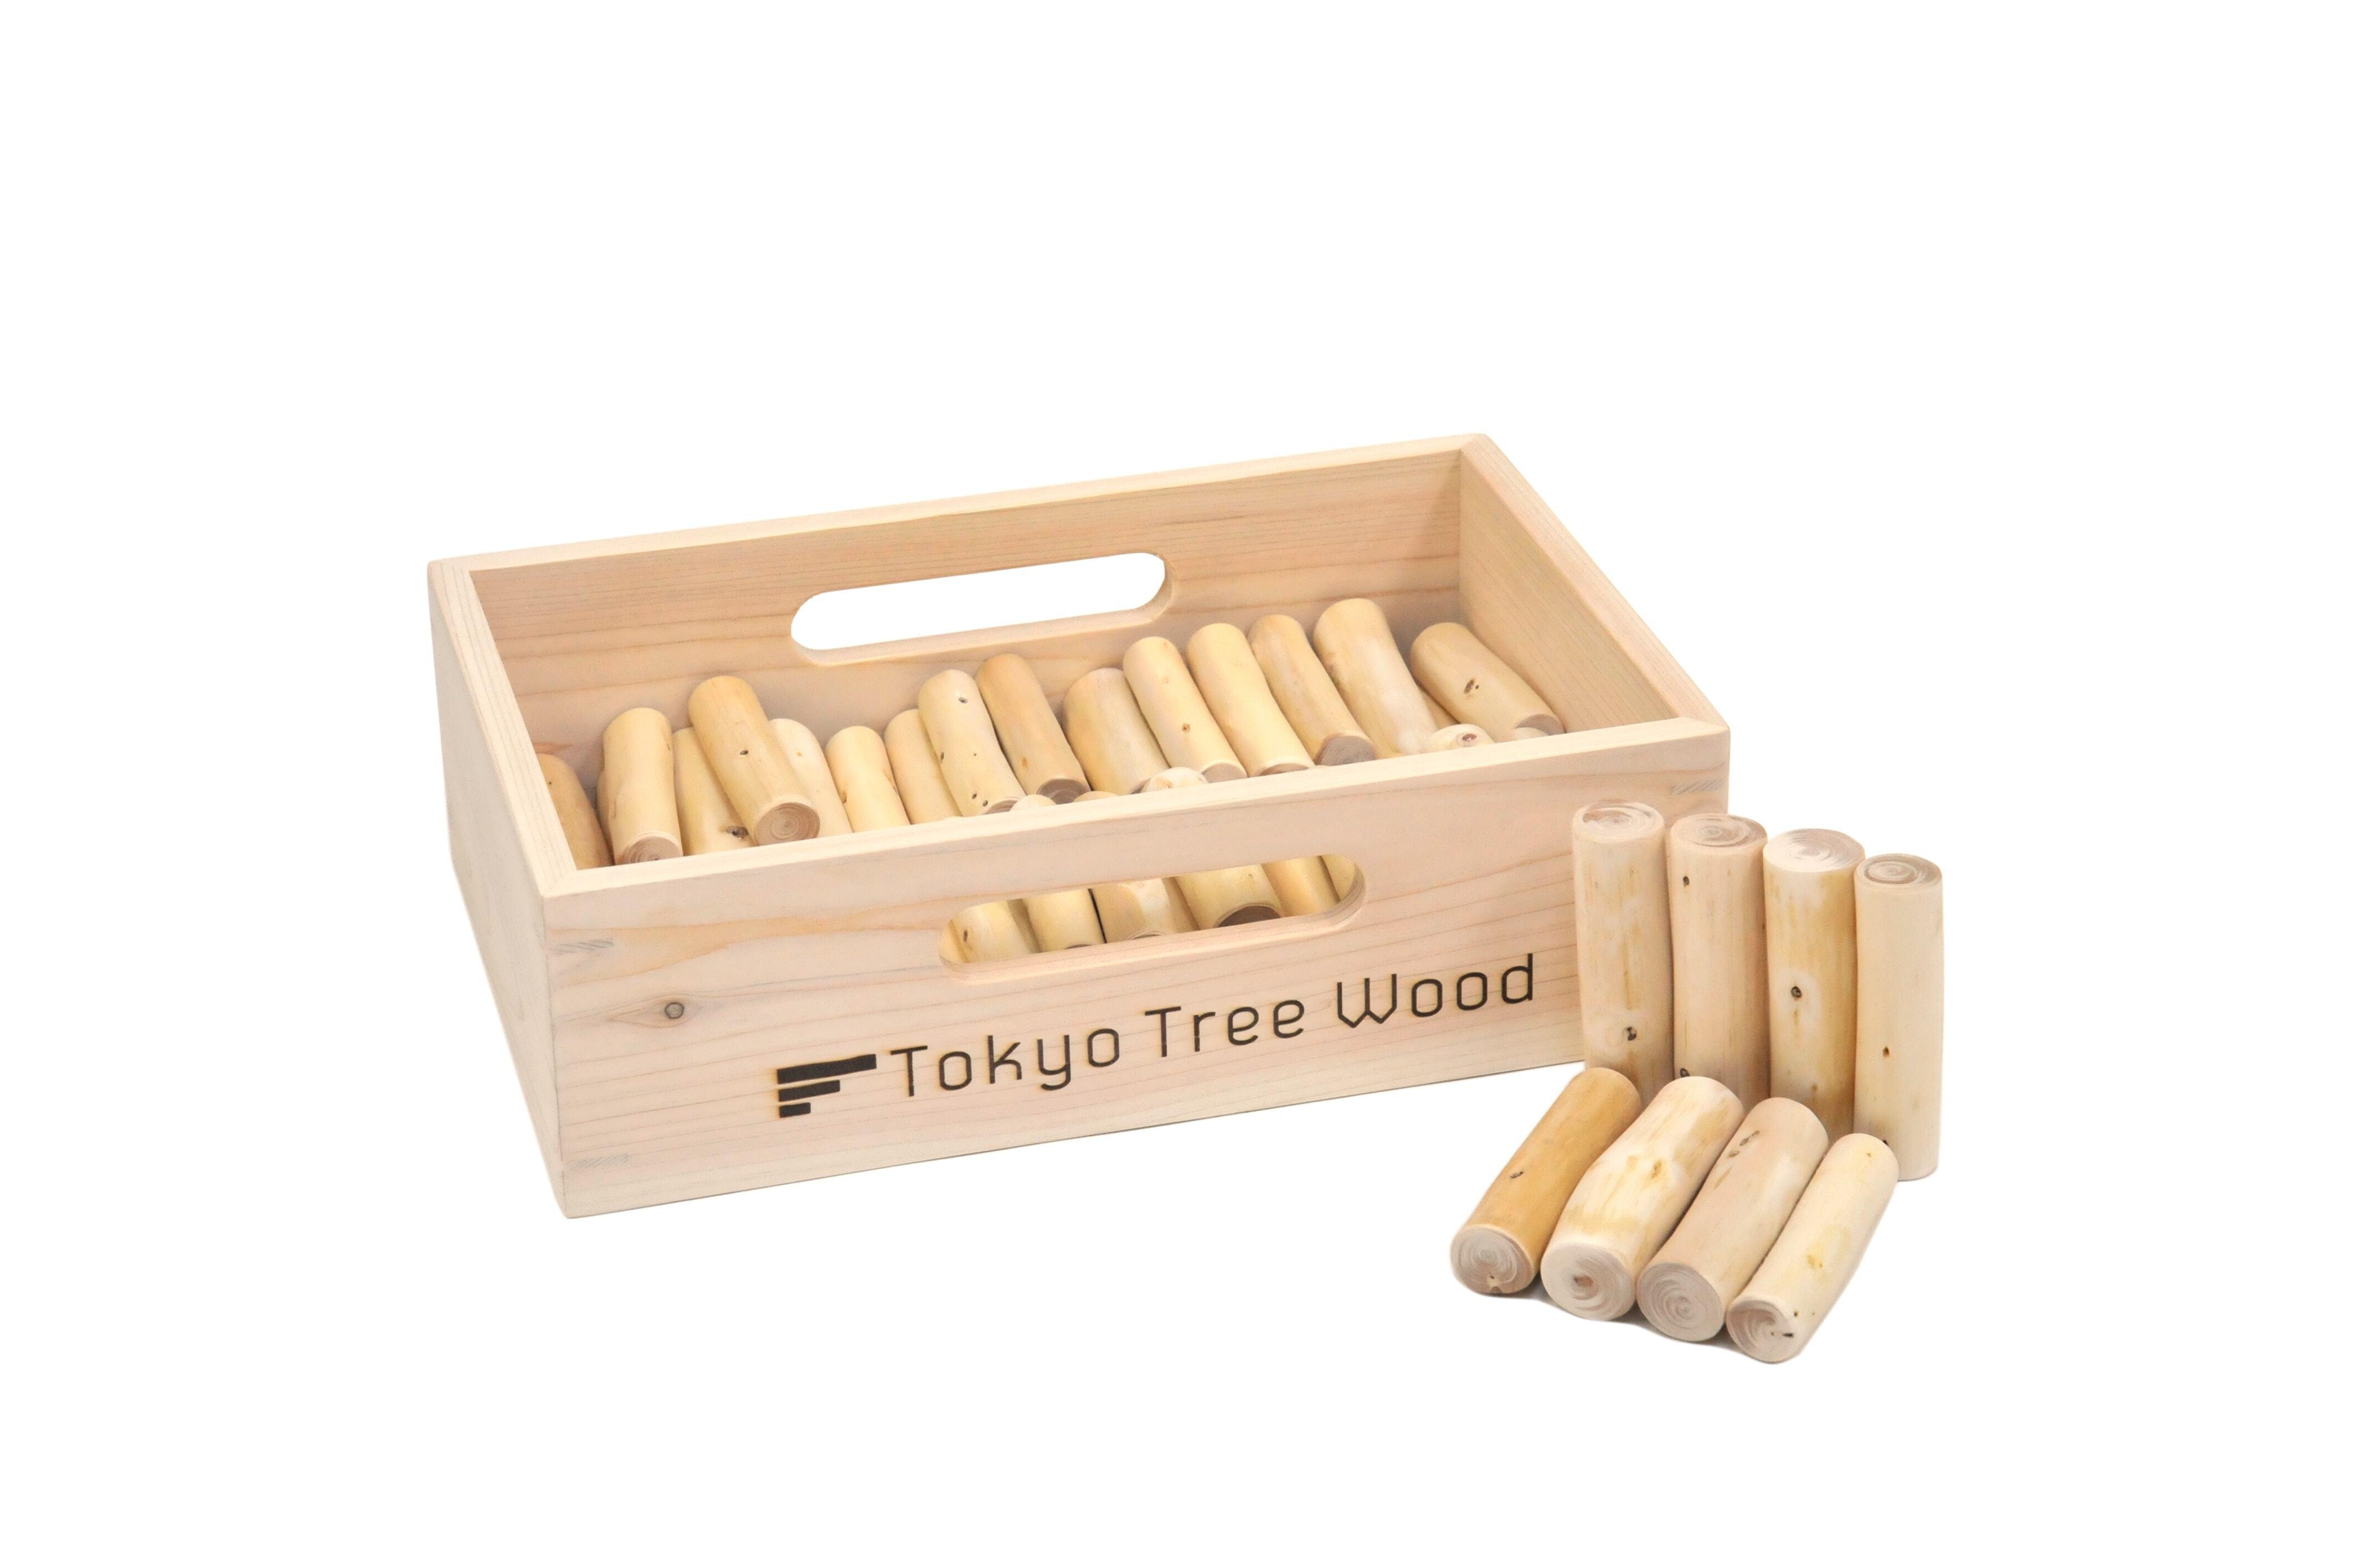 Tokyo Tree Wood ウチエダ三寸